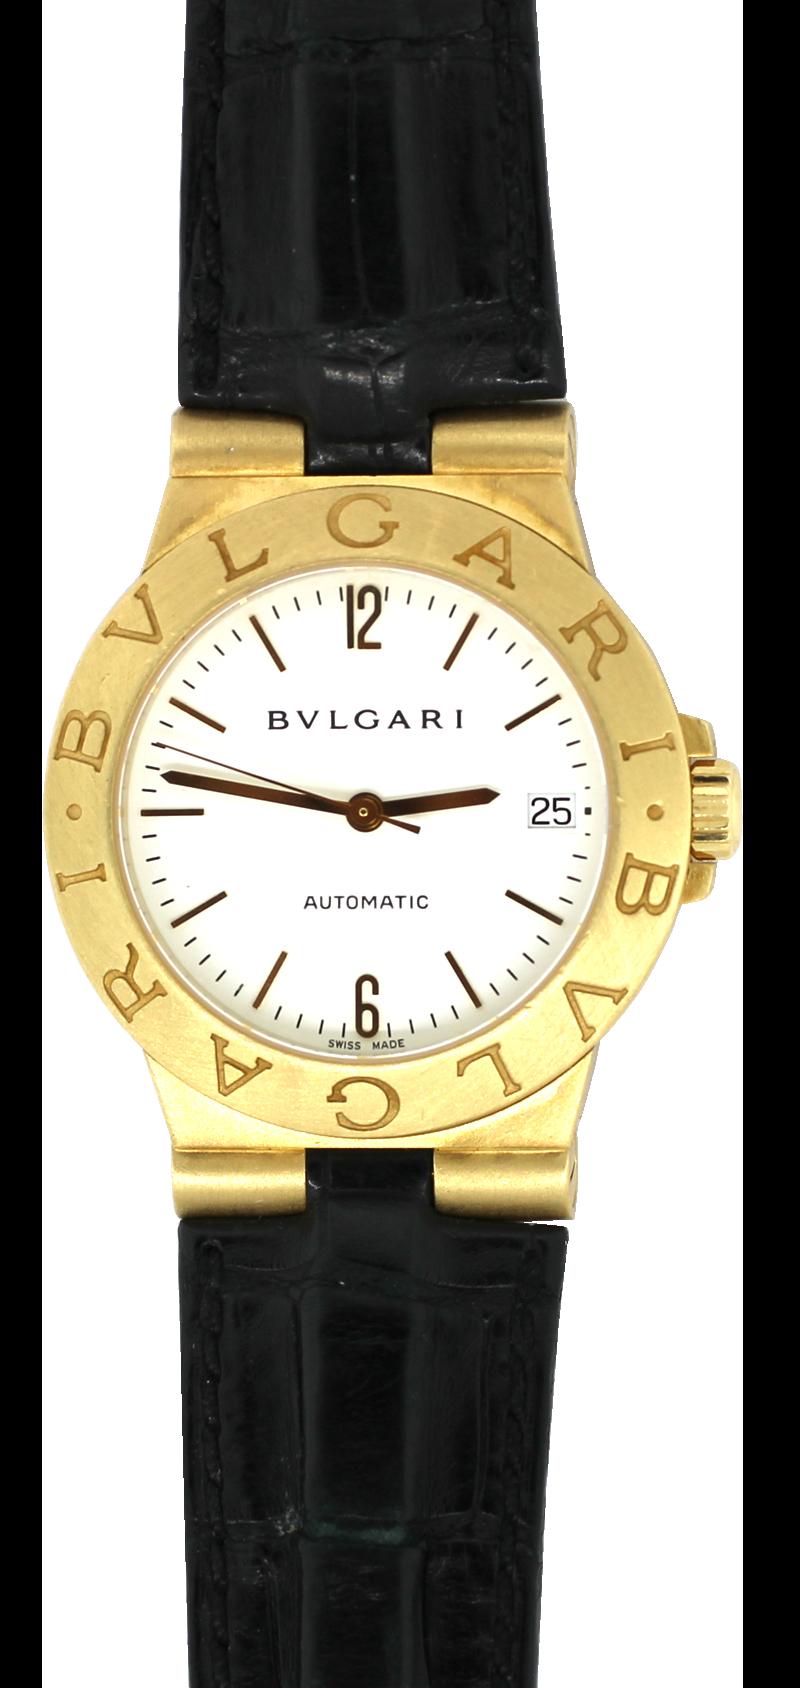 Bvlgari 18k Yellow Gold Diagono Automatic with Date White Dial LCV 35 G 18k on Strap